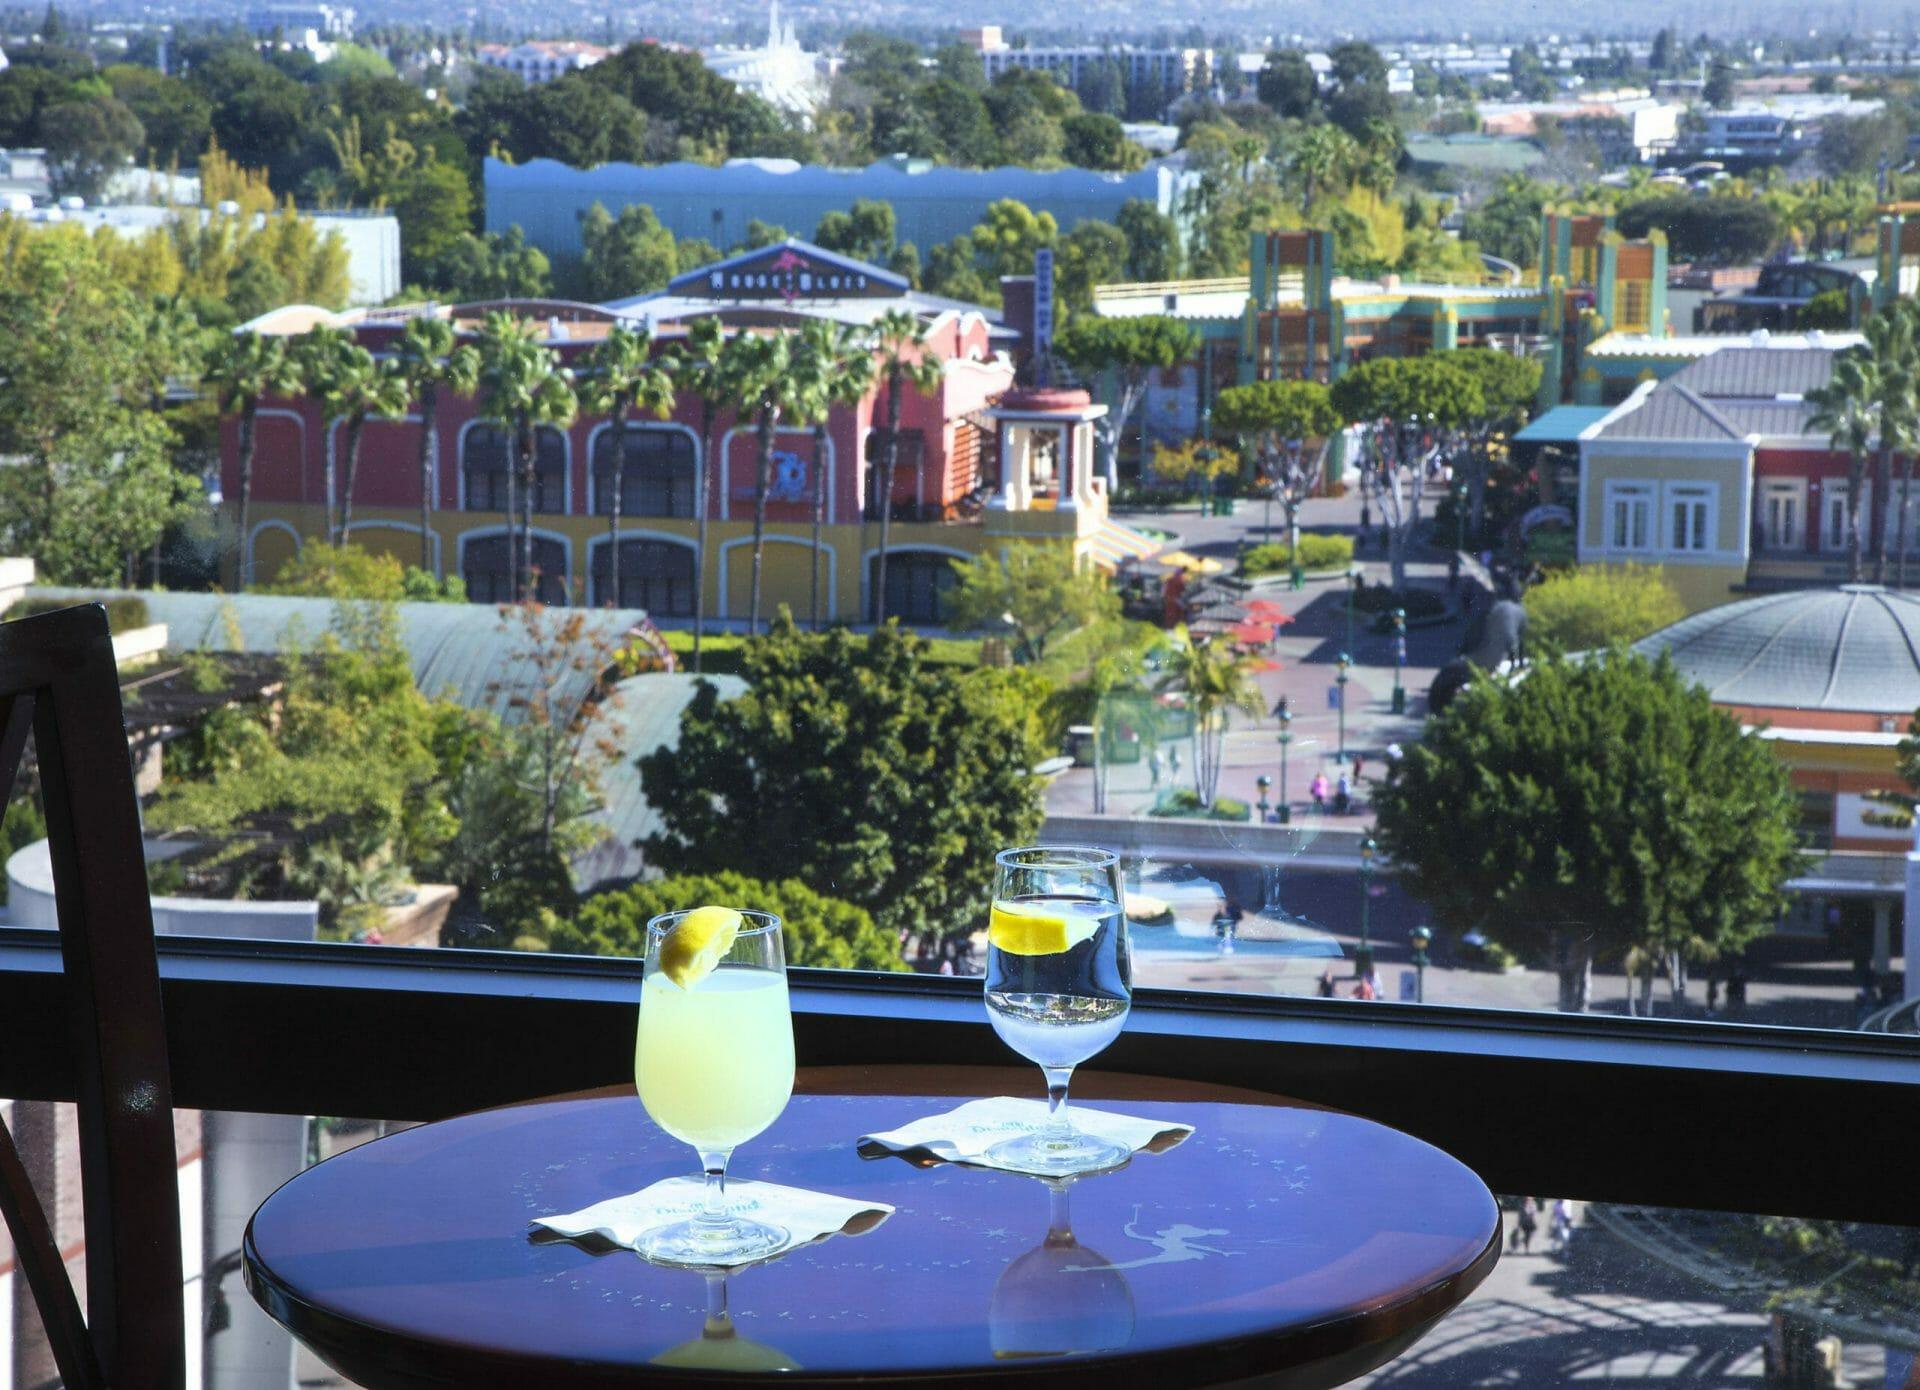 Club Level at the Disneyland Resort